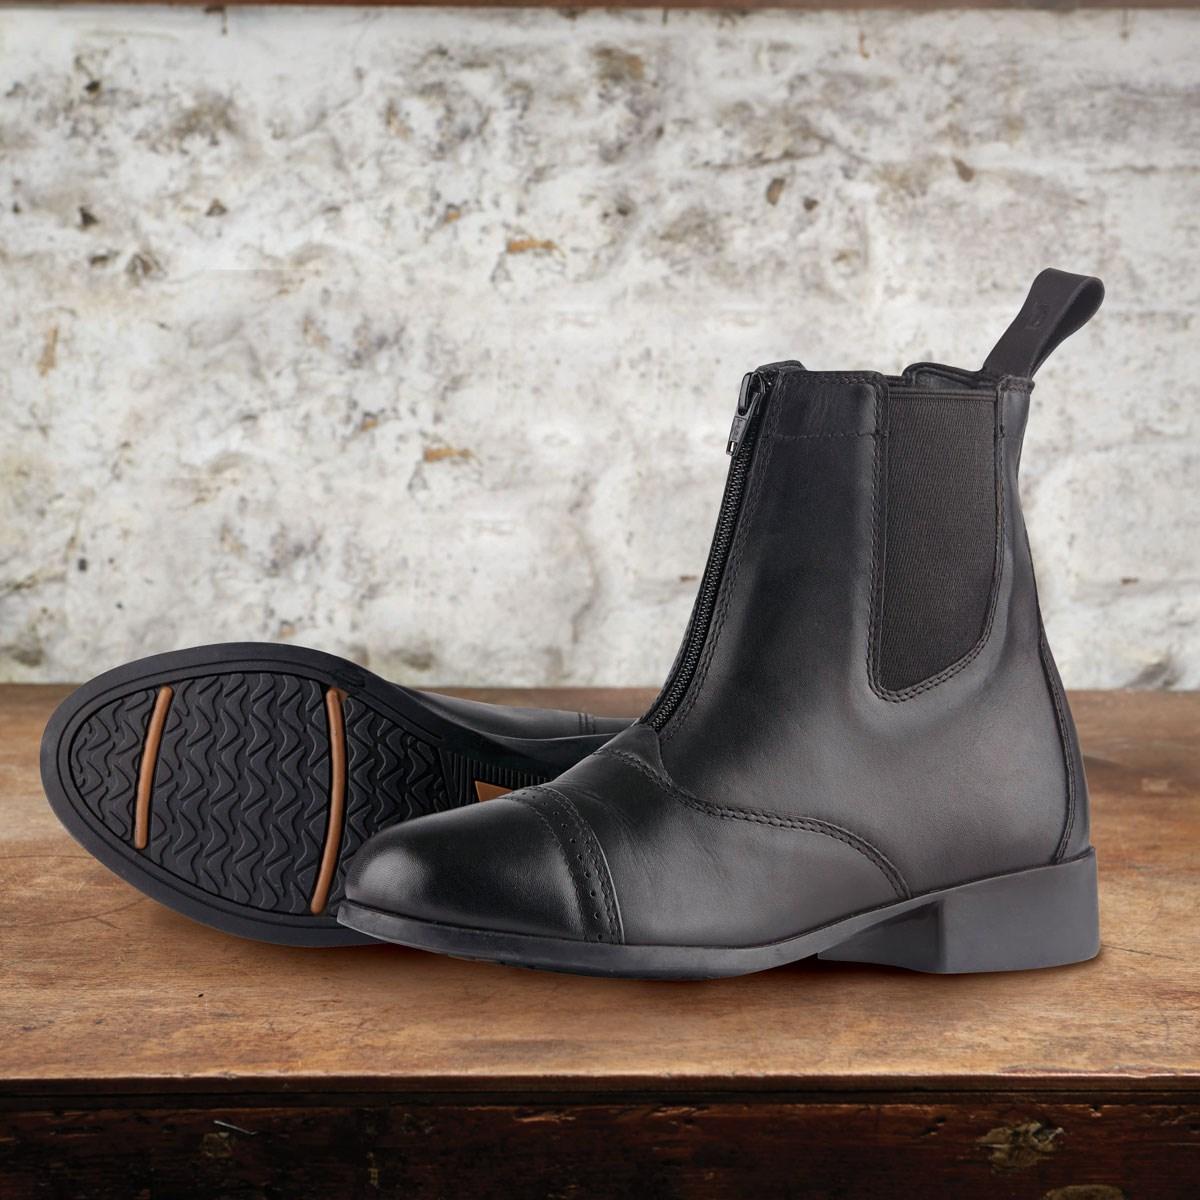 5b15d493fe46 Dublin Elevation II Zip Jodhpur Boots - Black - Redpost Equestrian